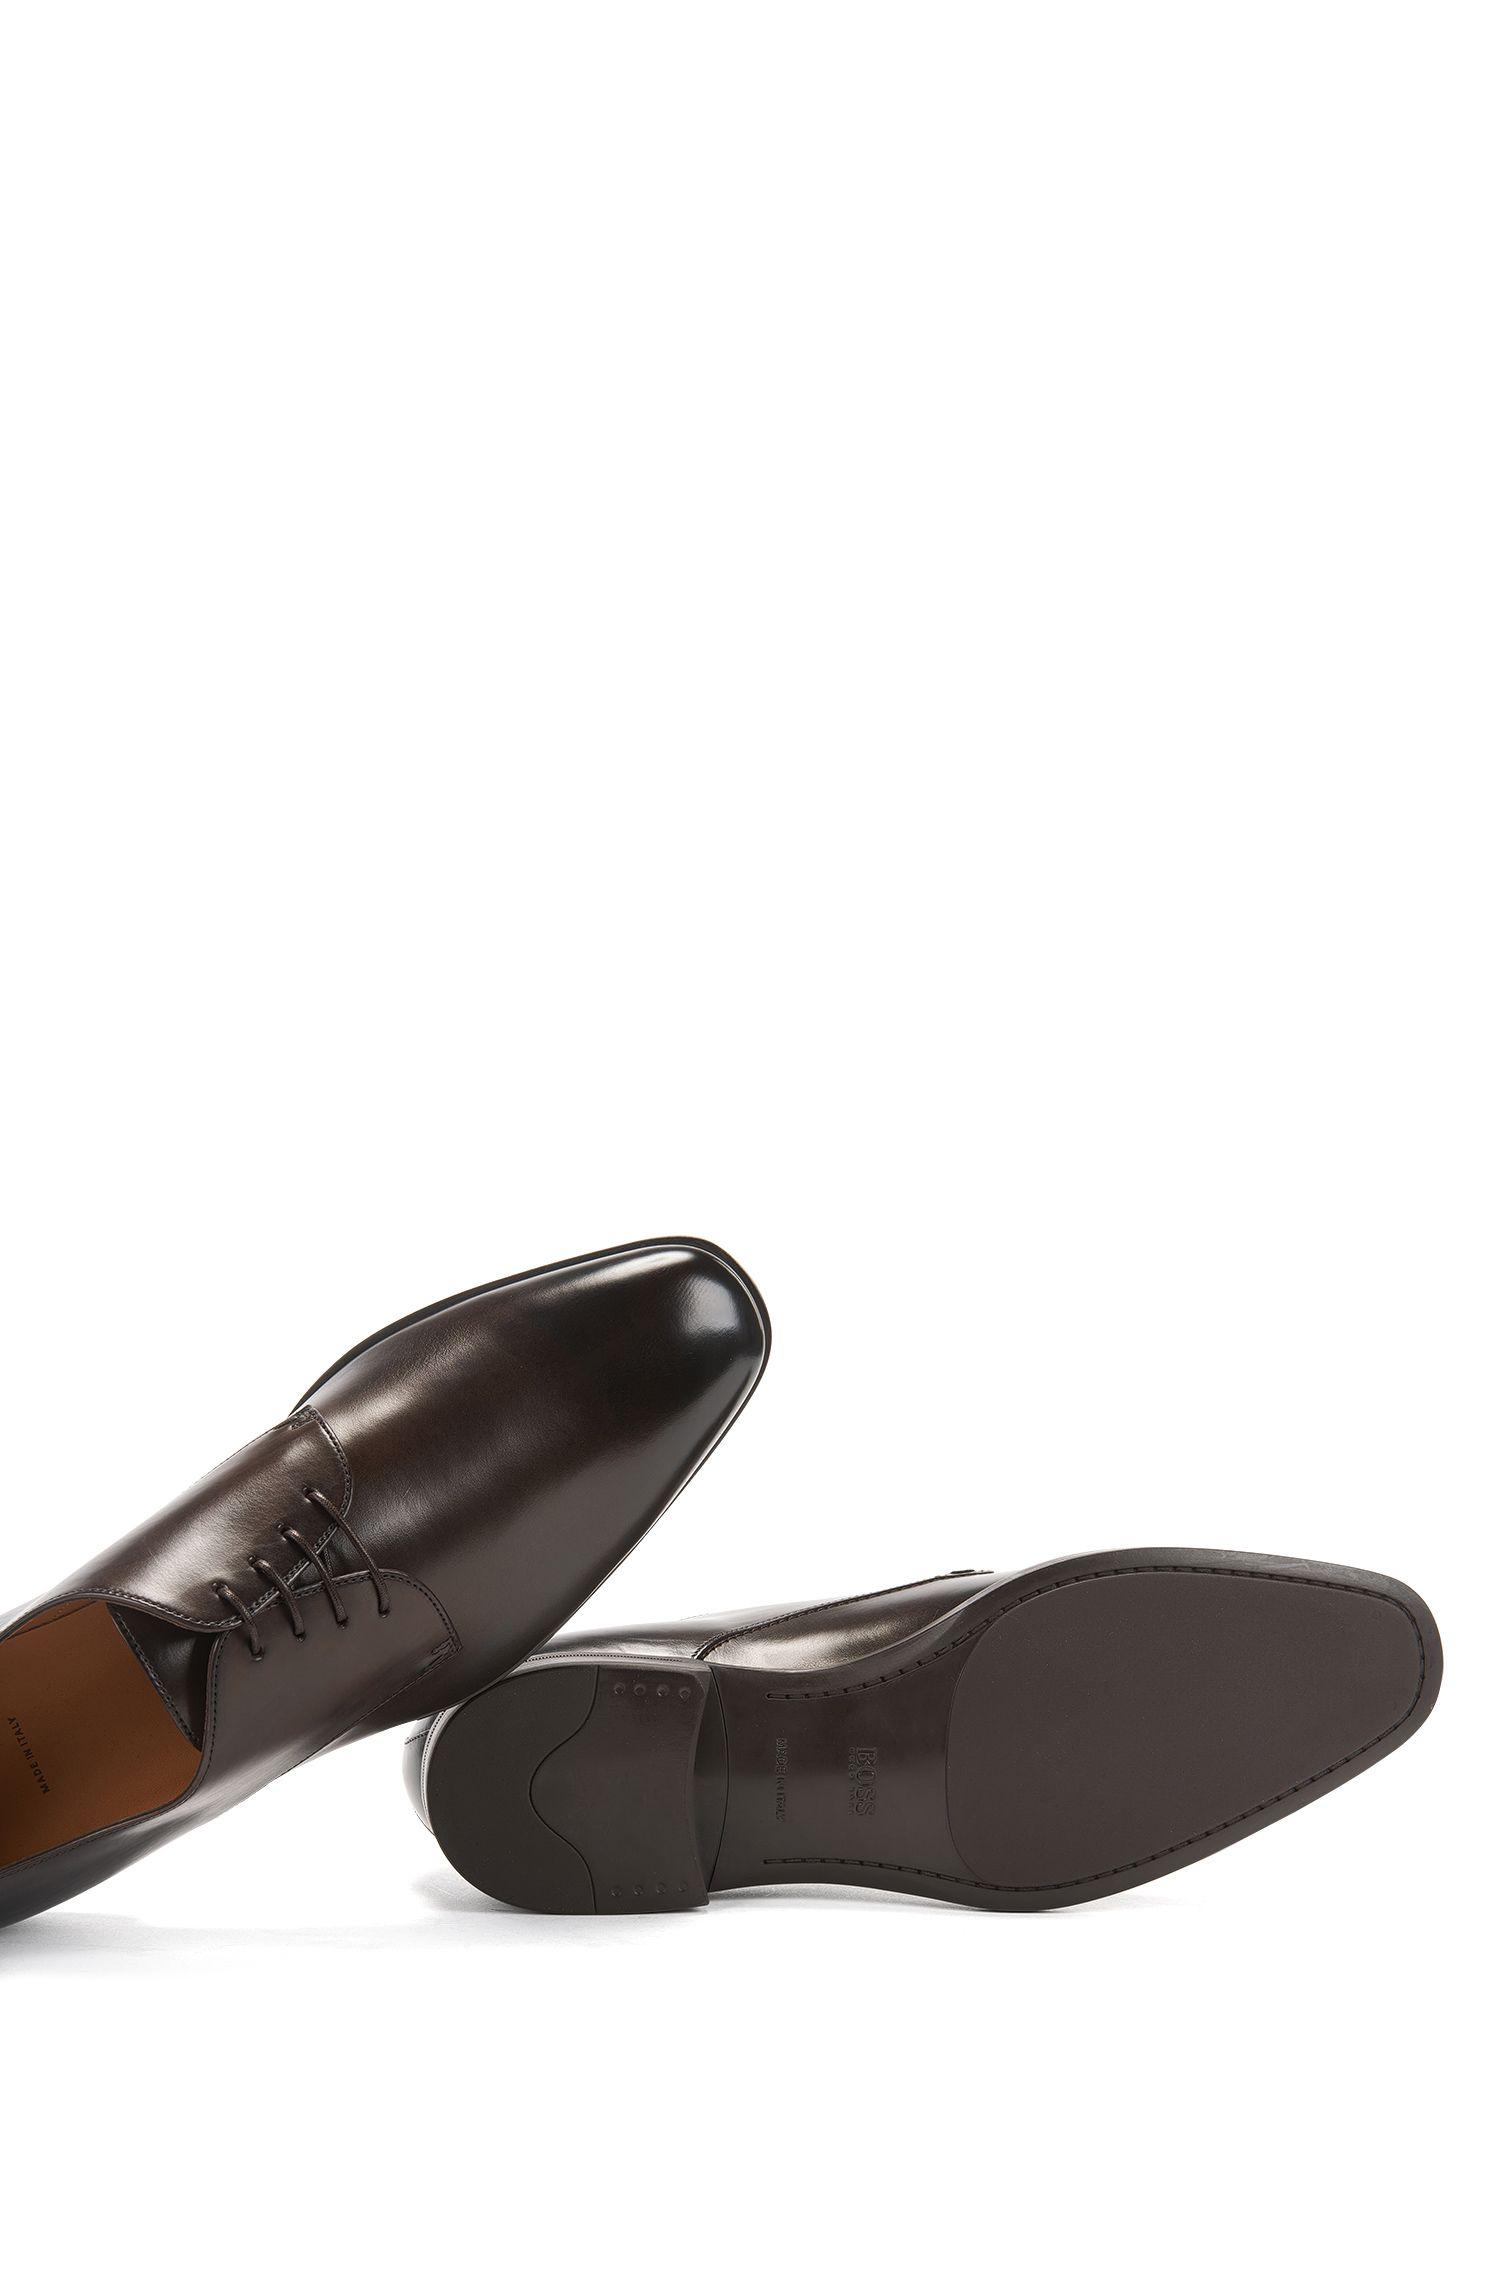 Chaussures derby en cuir poli